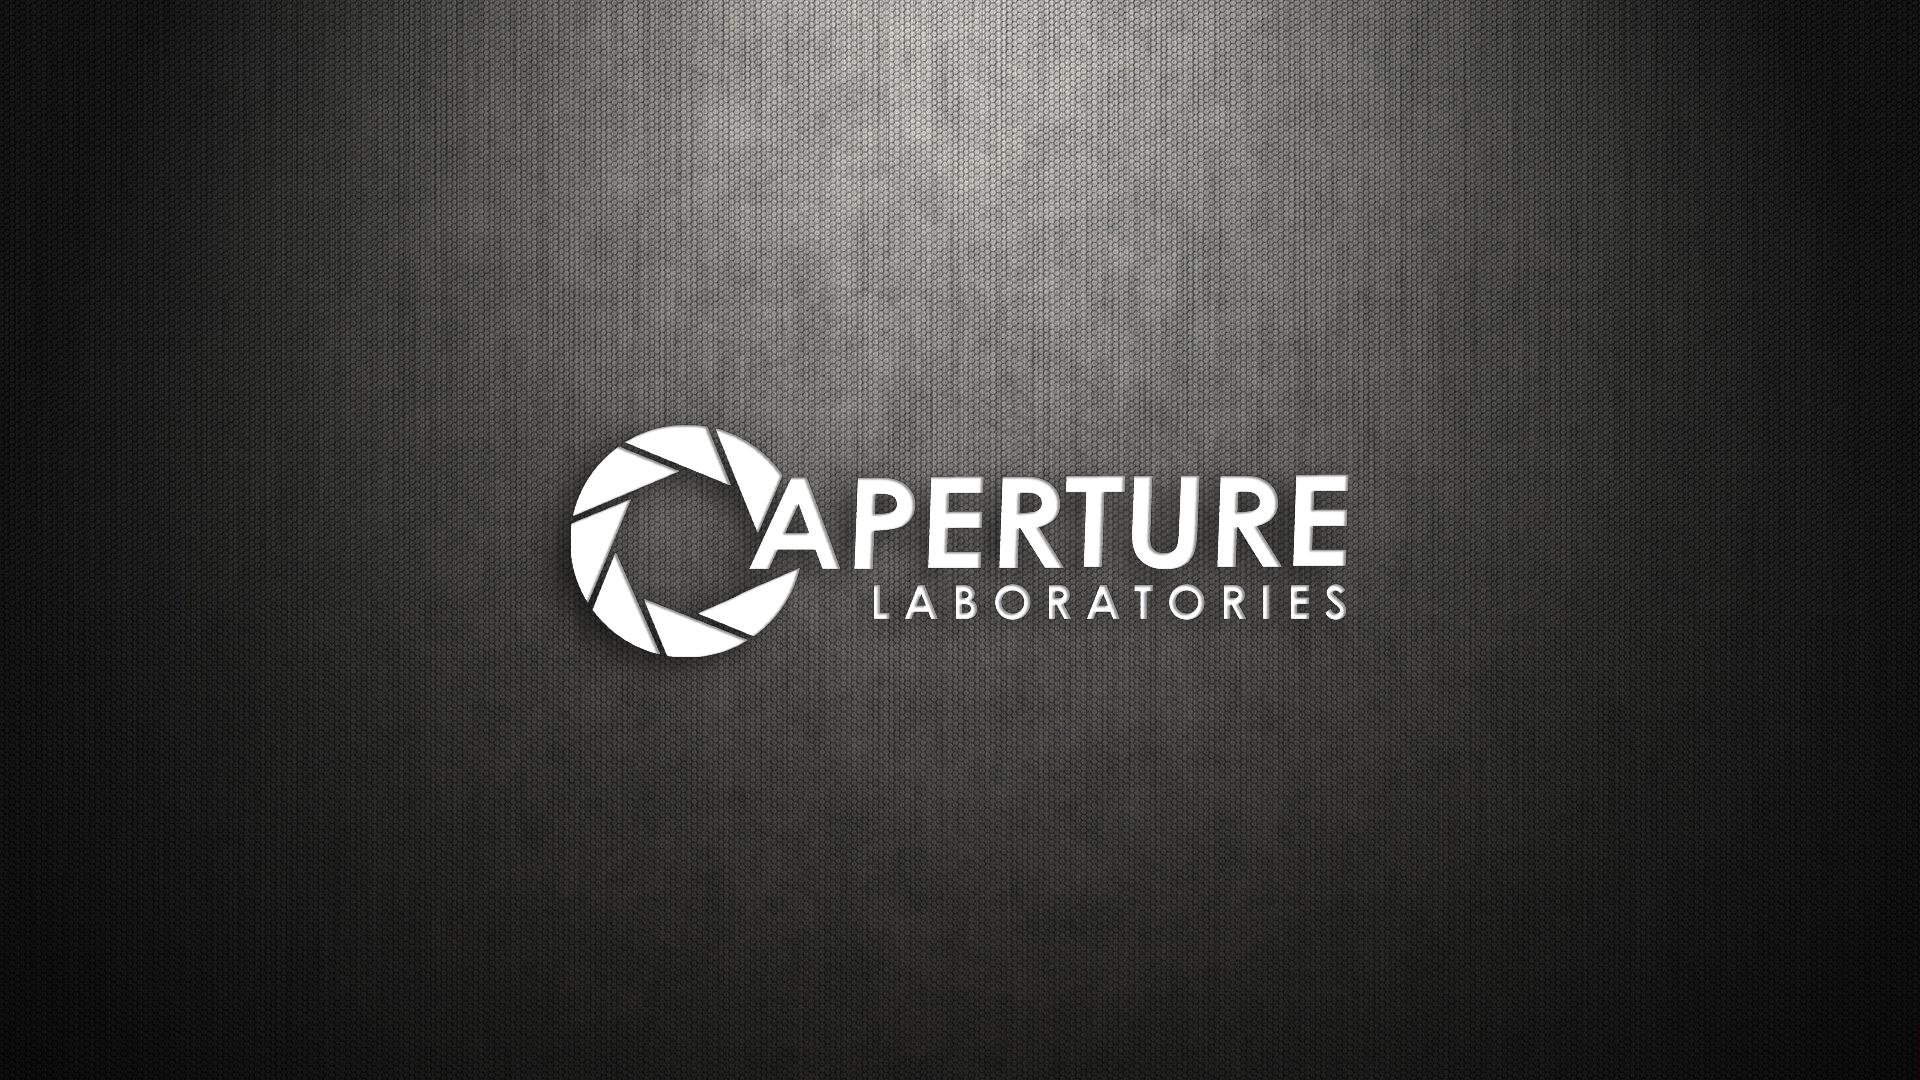 Aperture Laboratories Wallpaper 1920x1080 Aperture Laboratories 1920x1080